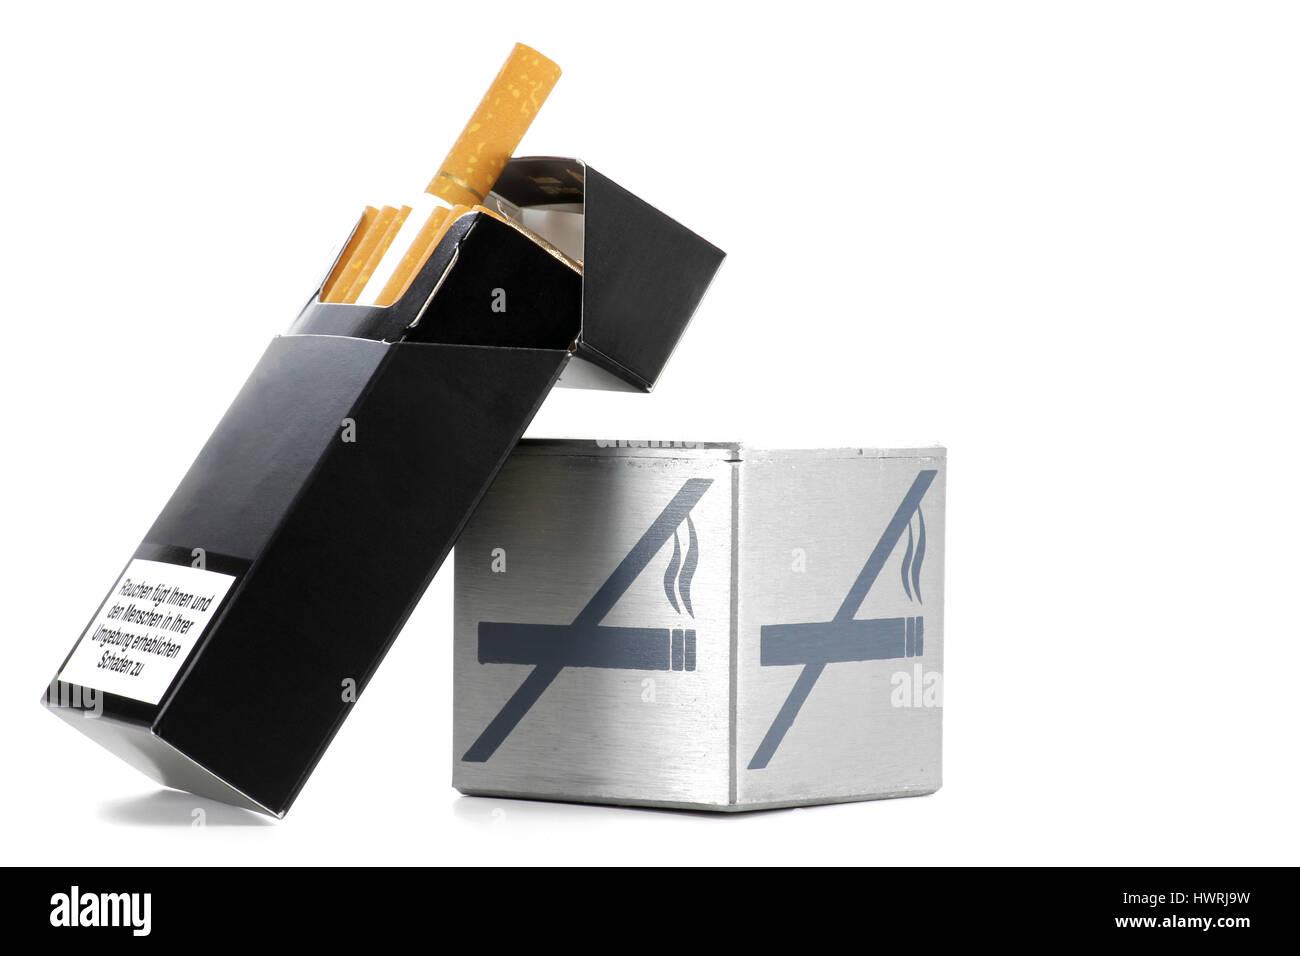 Buy Dunhill Pall Mall cigarettes USA